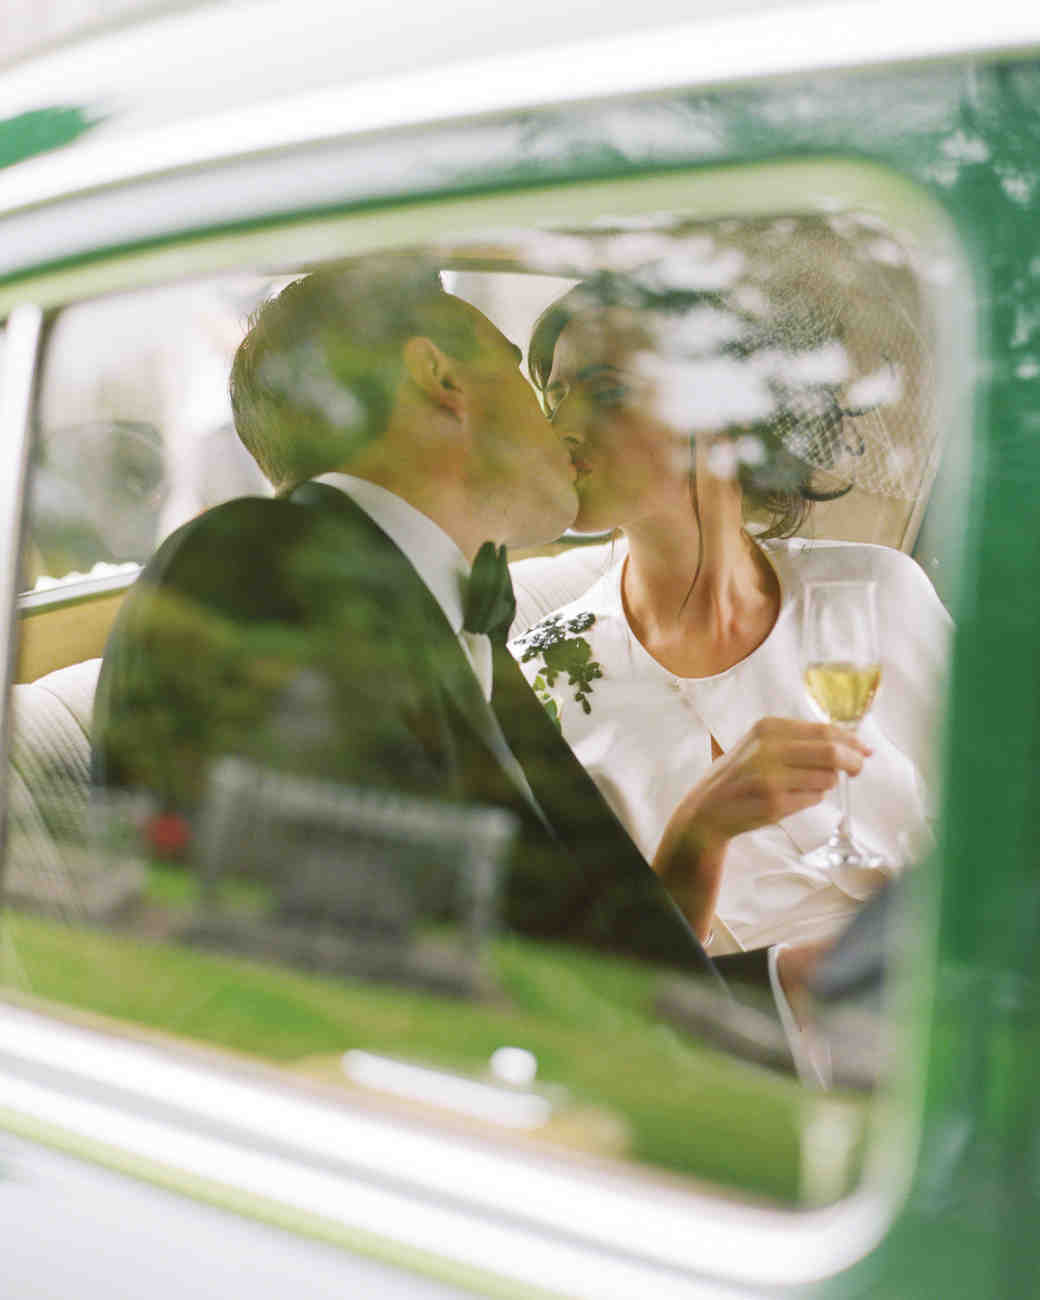 Irish Wedding Gifts Traditions: 10 Irish Wedding Traditions For Your Big Day